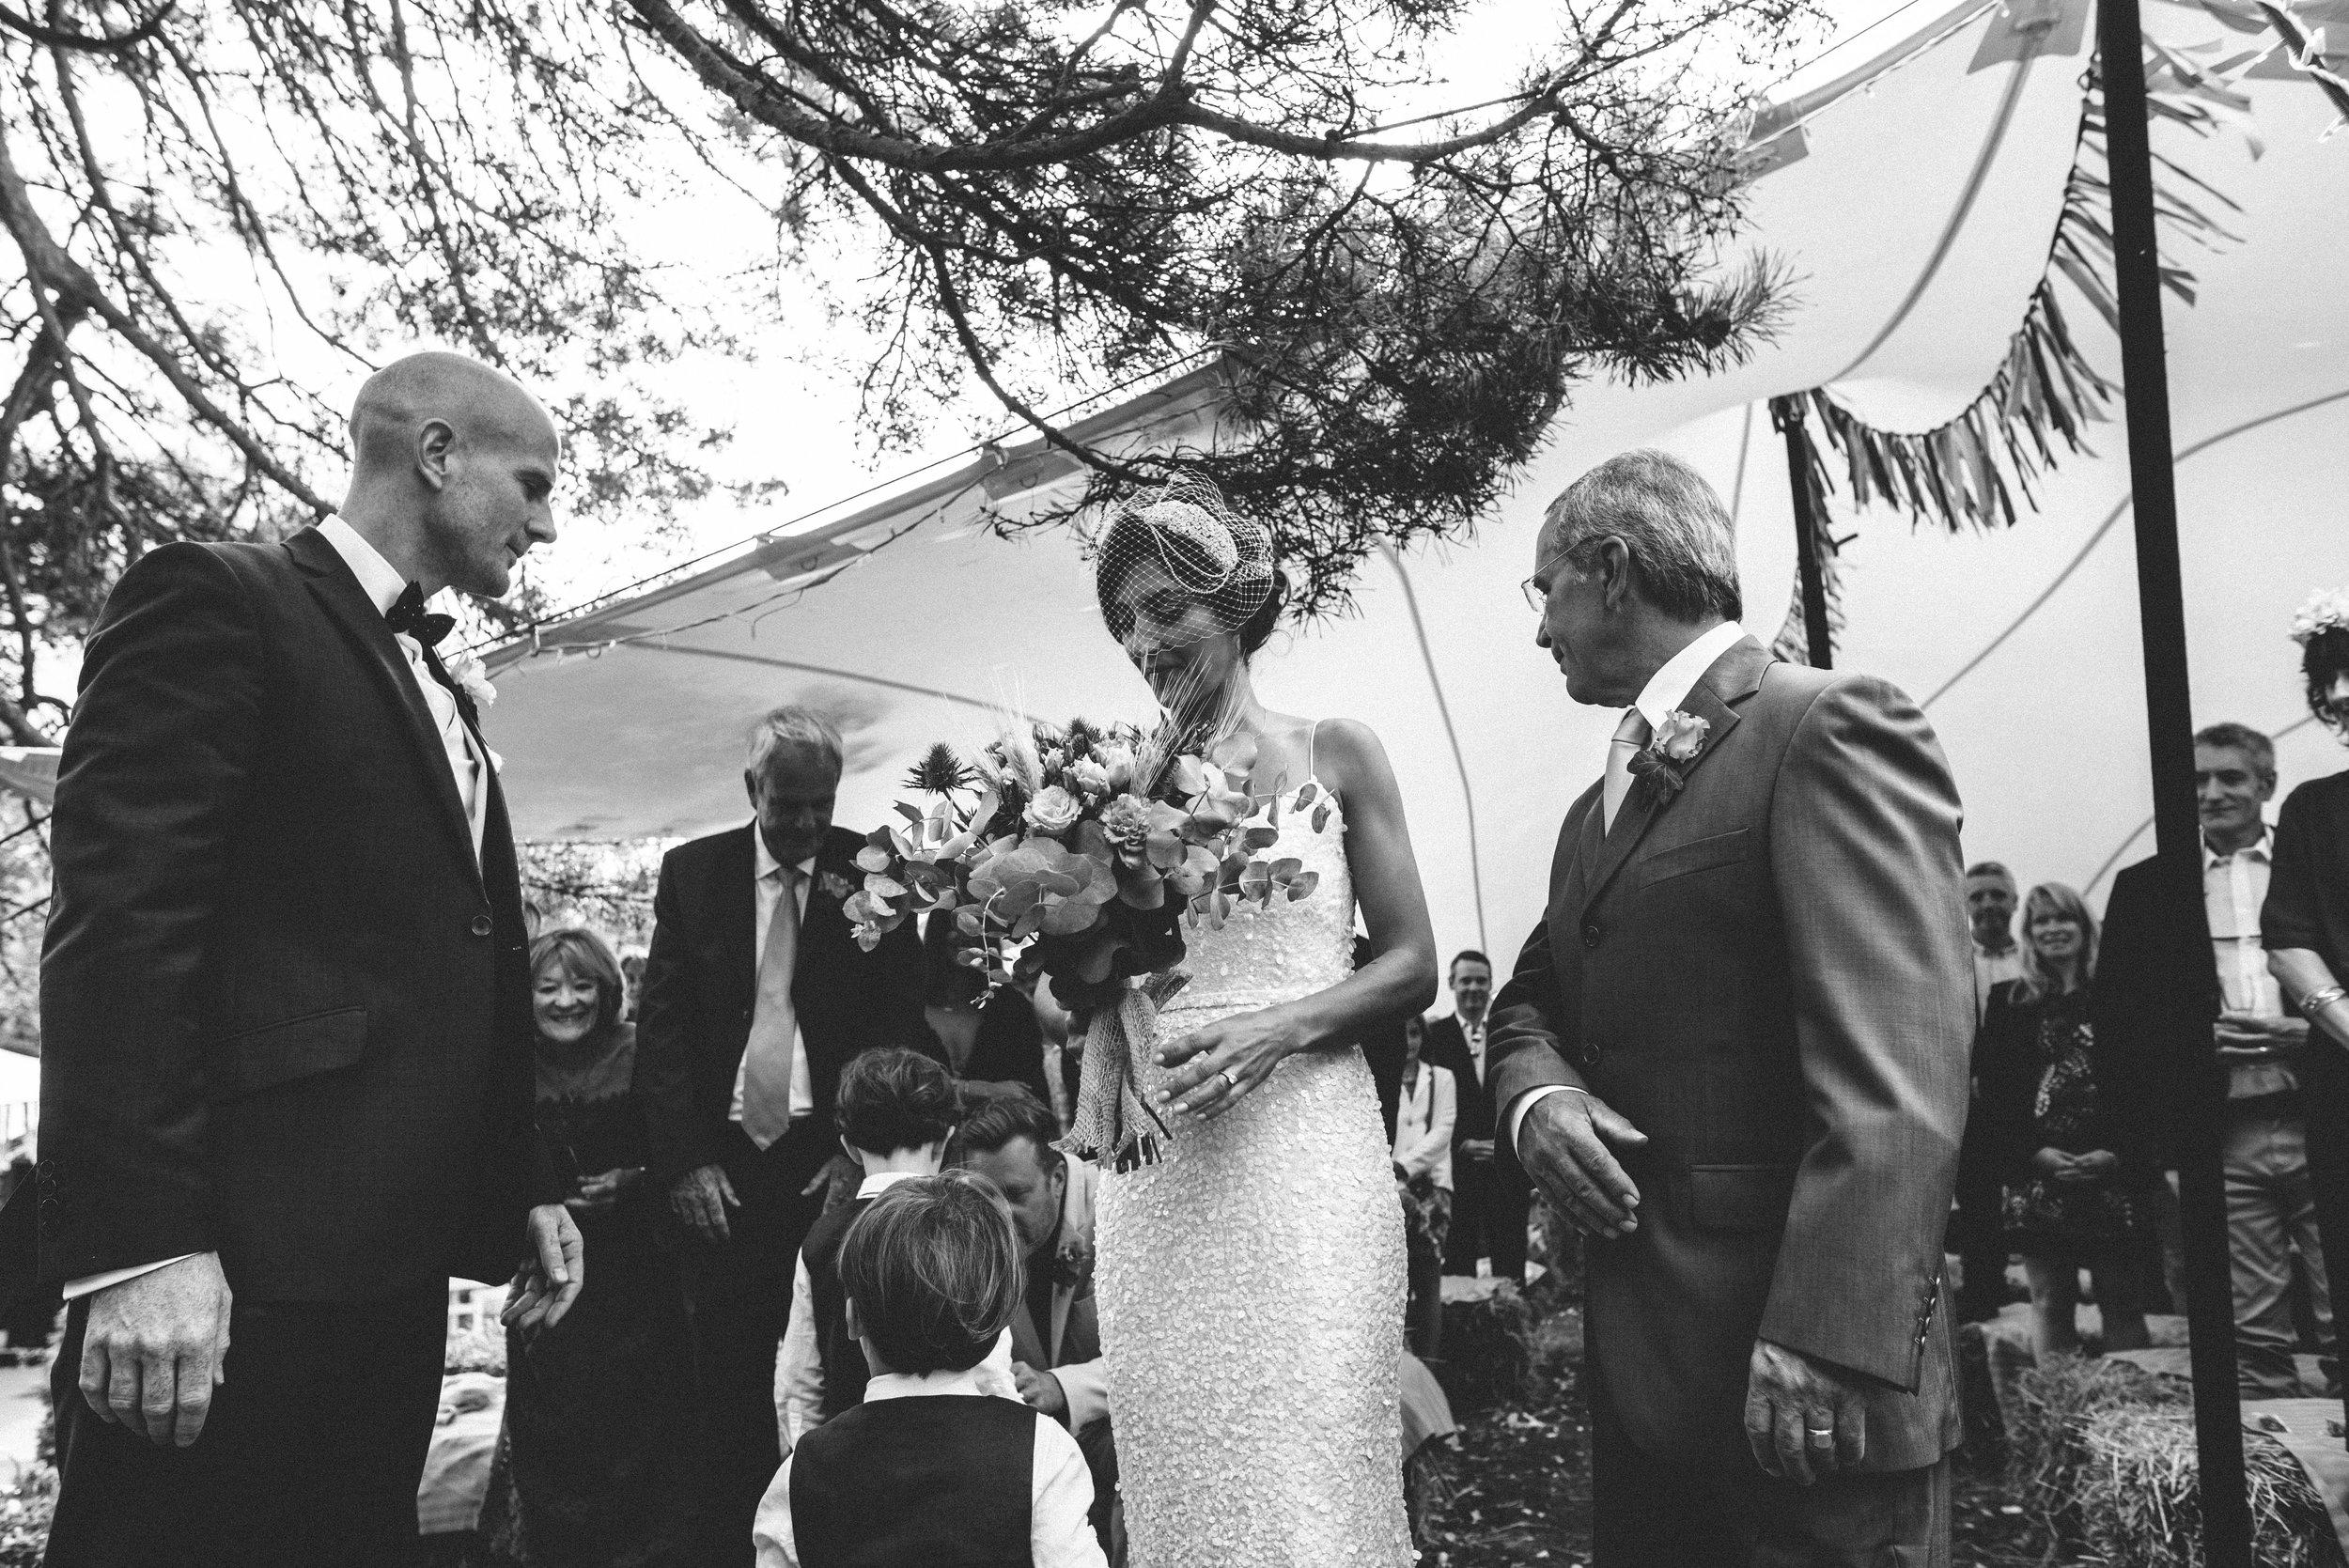 Garden Wedding photography Barley Herefordshire - Tracy + Matt -151.jpg